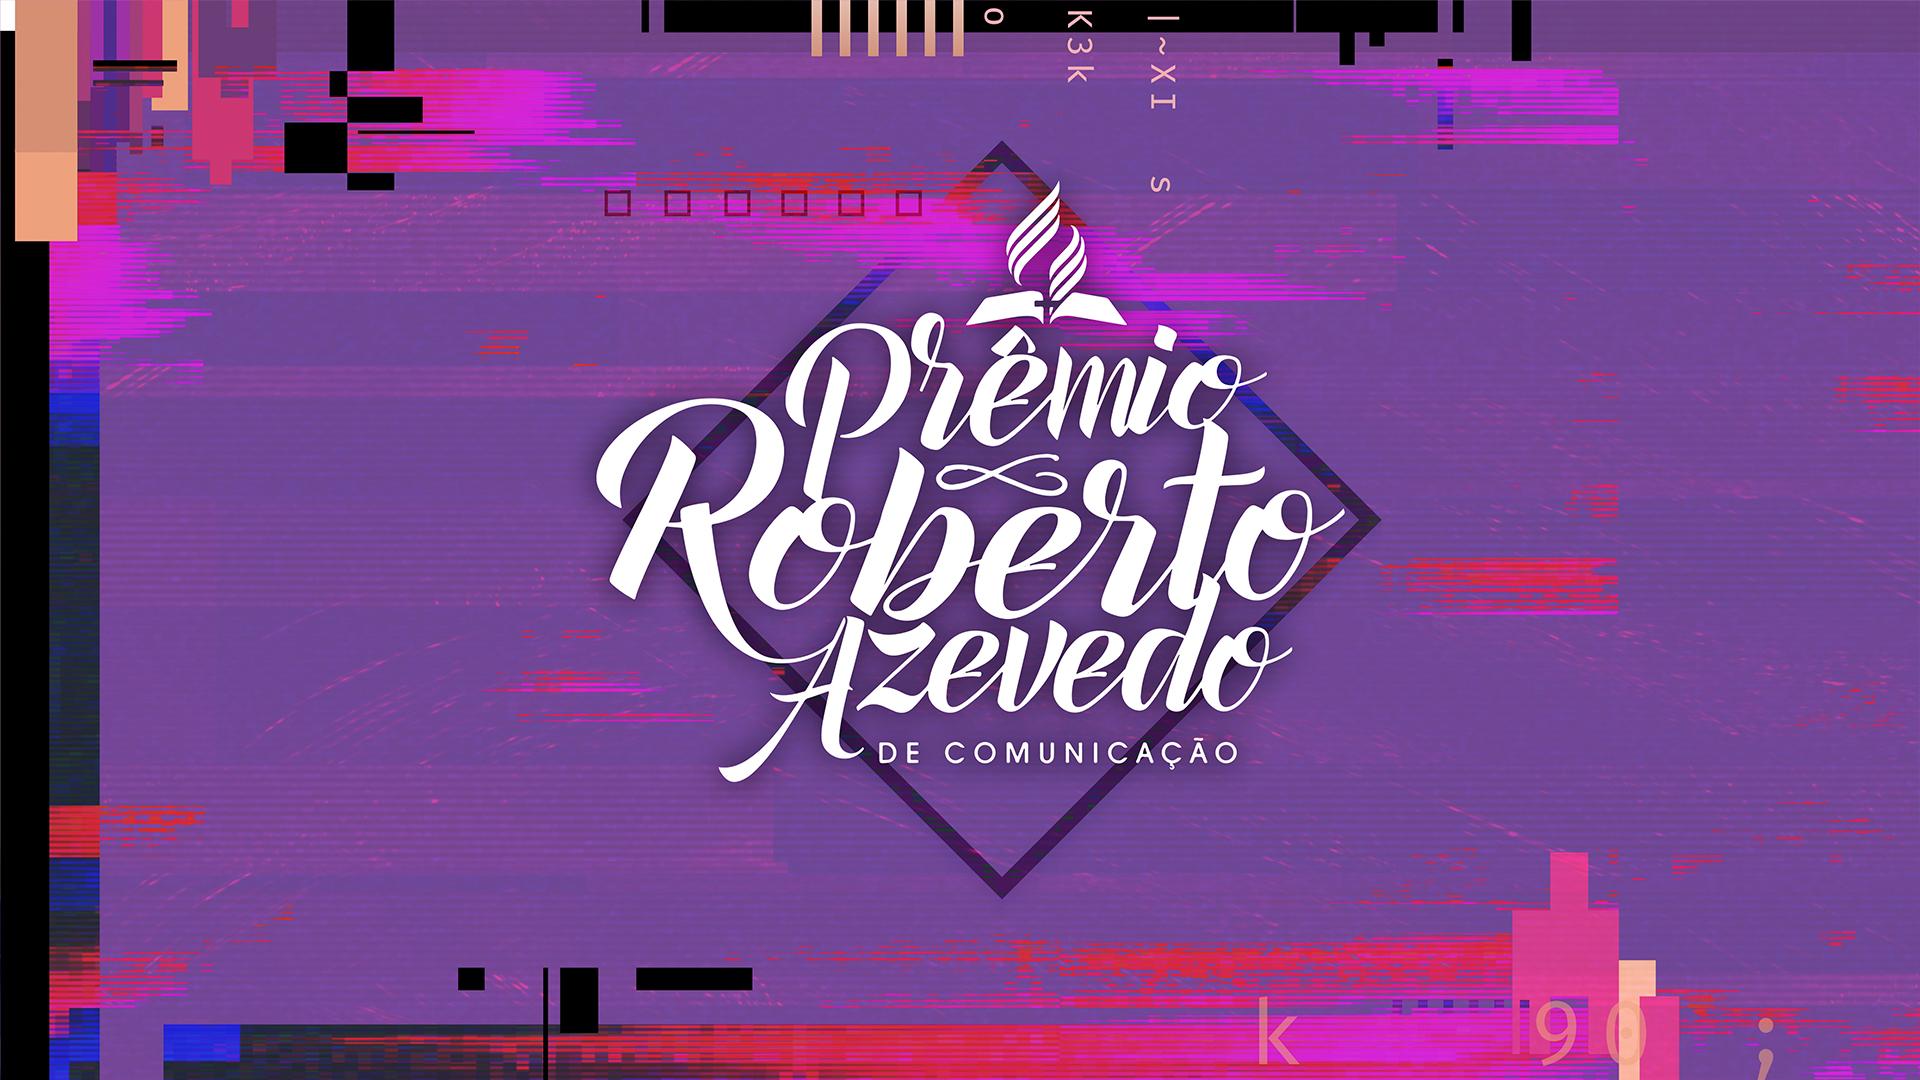 Prêmio Roberto Azevedo